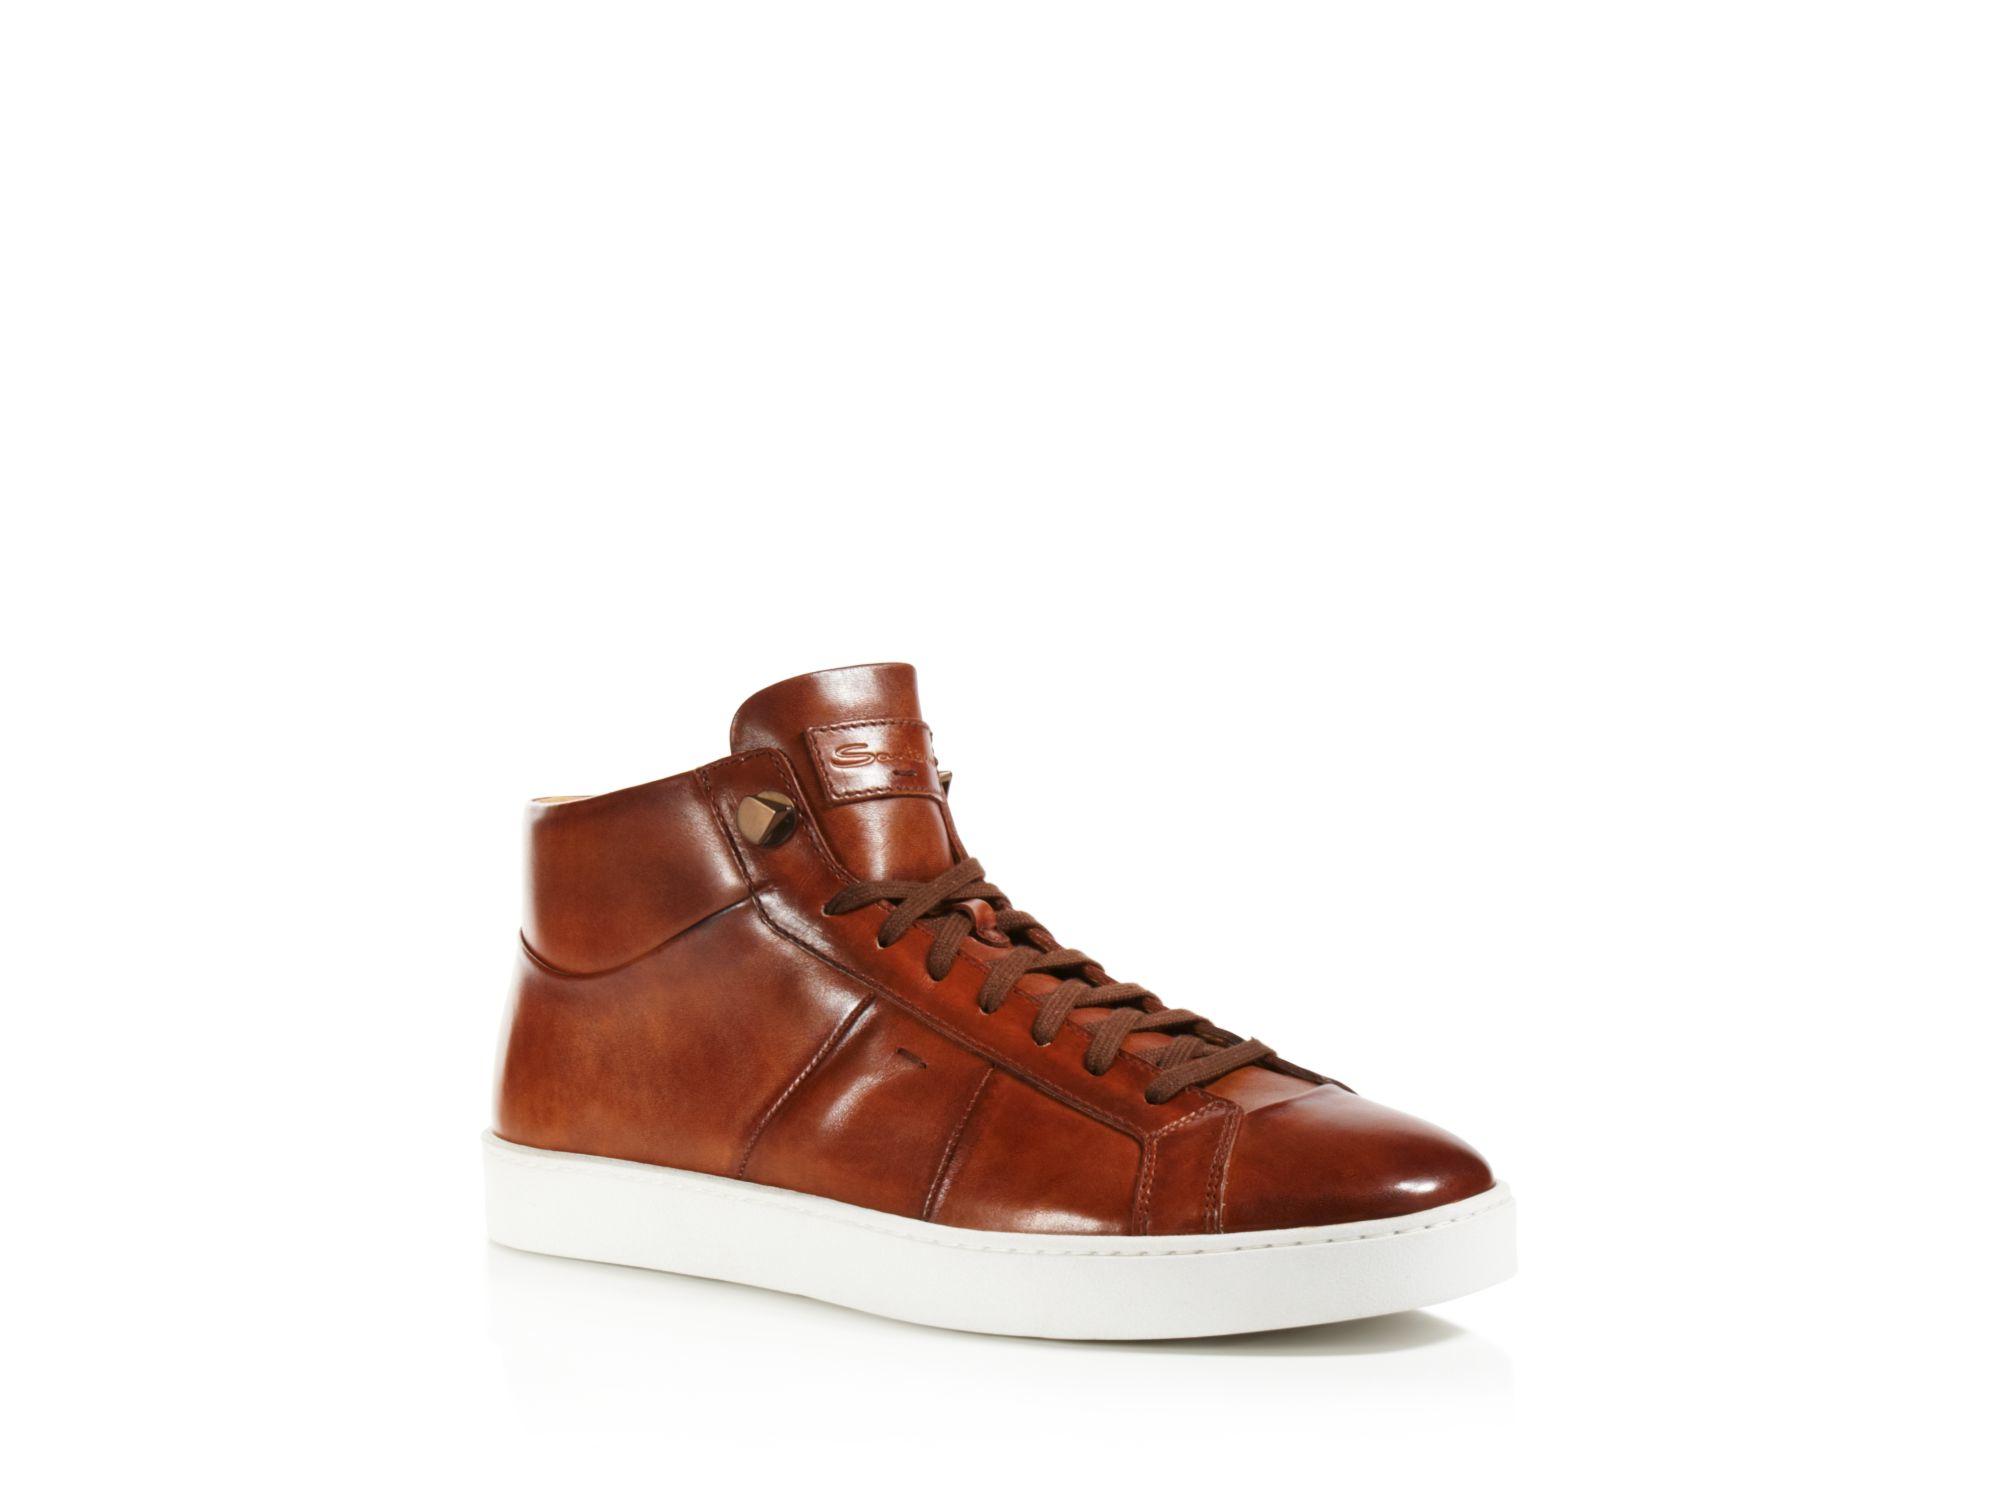 Santoni Gloria High Top Sneakers in Tan